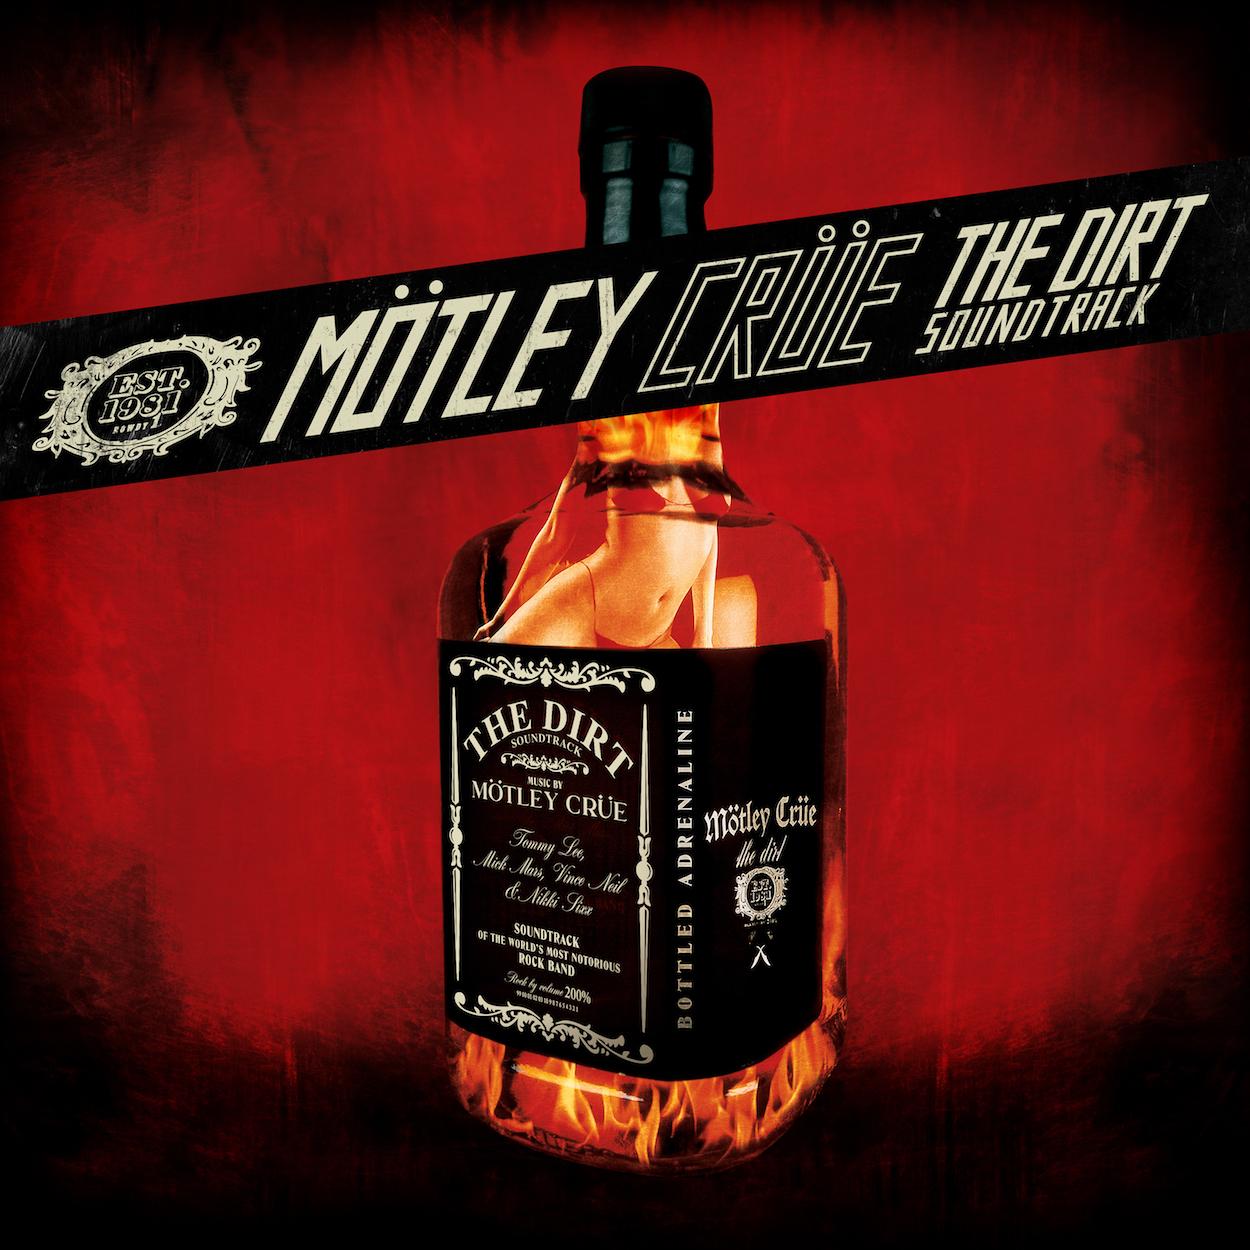 MÖTLEY CRÜE RELEASE THE DIRT MOVIE AND SOUNDTRACK — Mötley Crüe